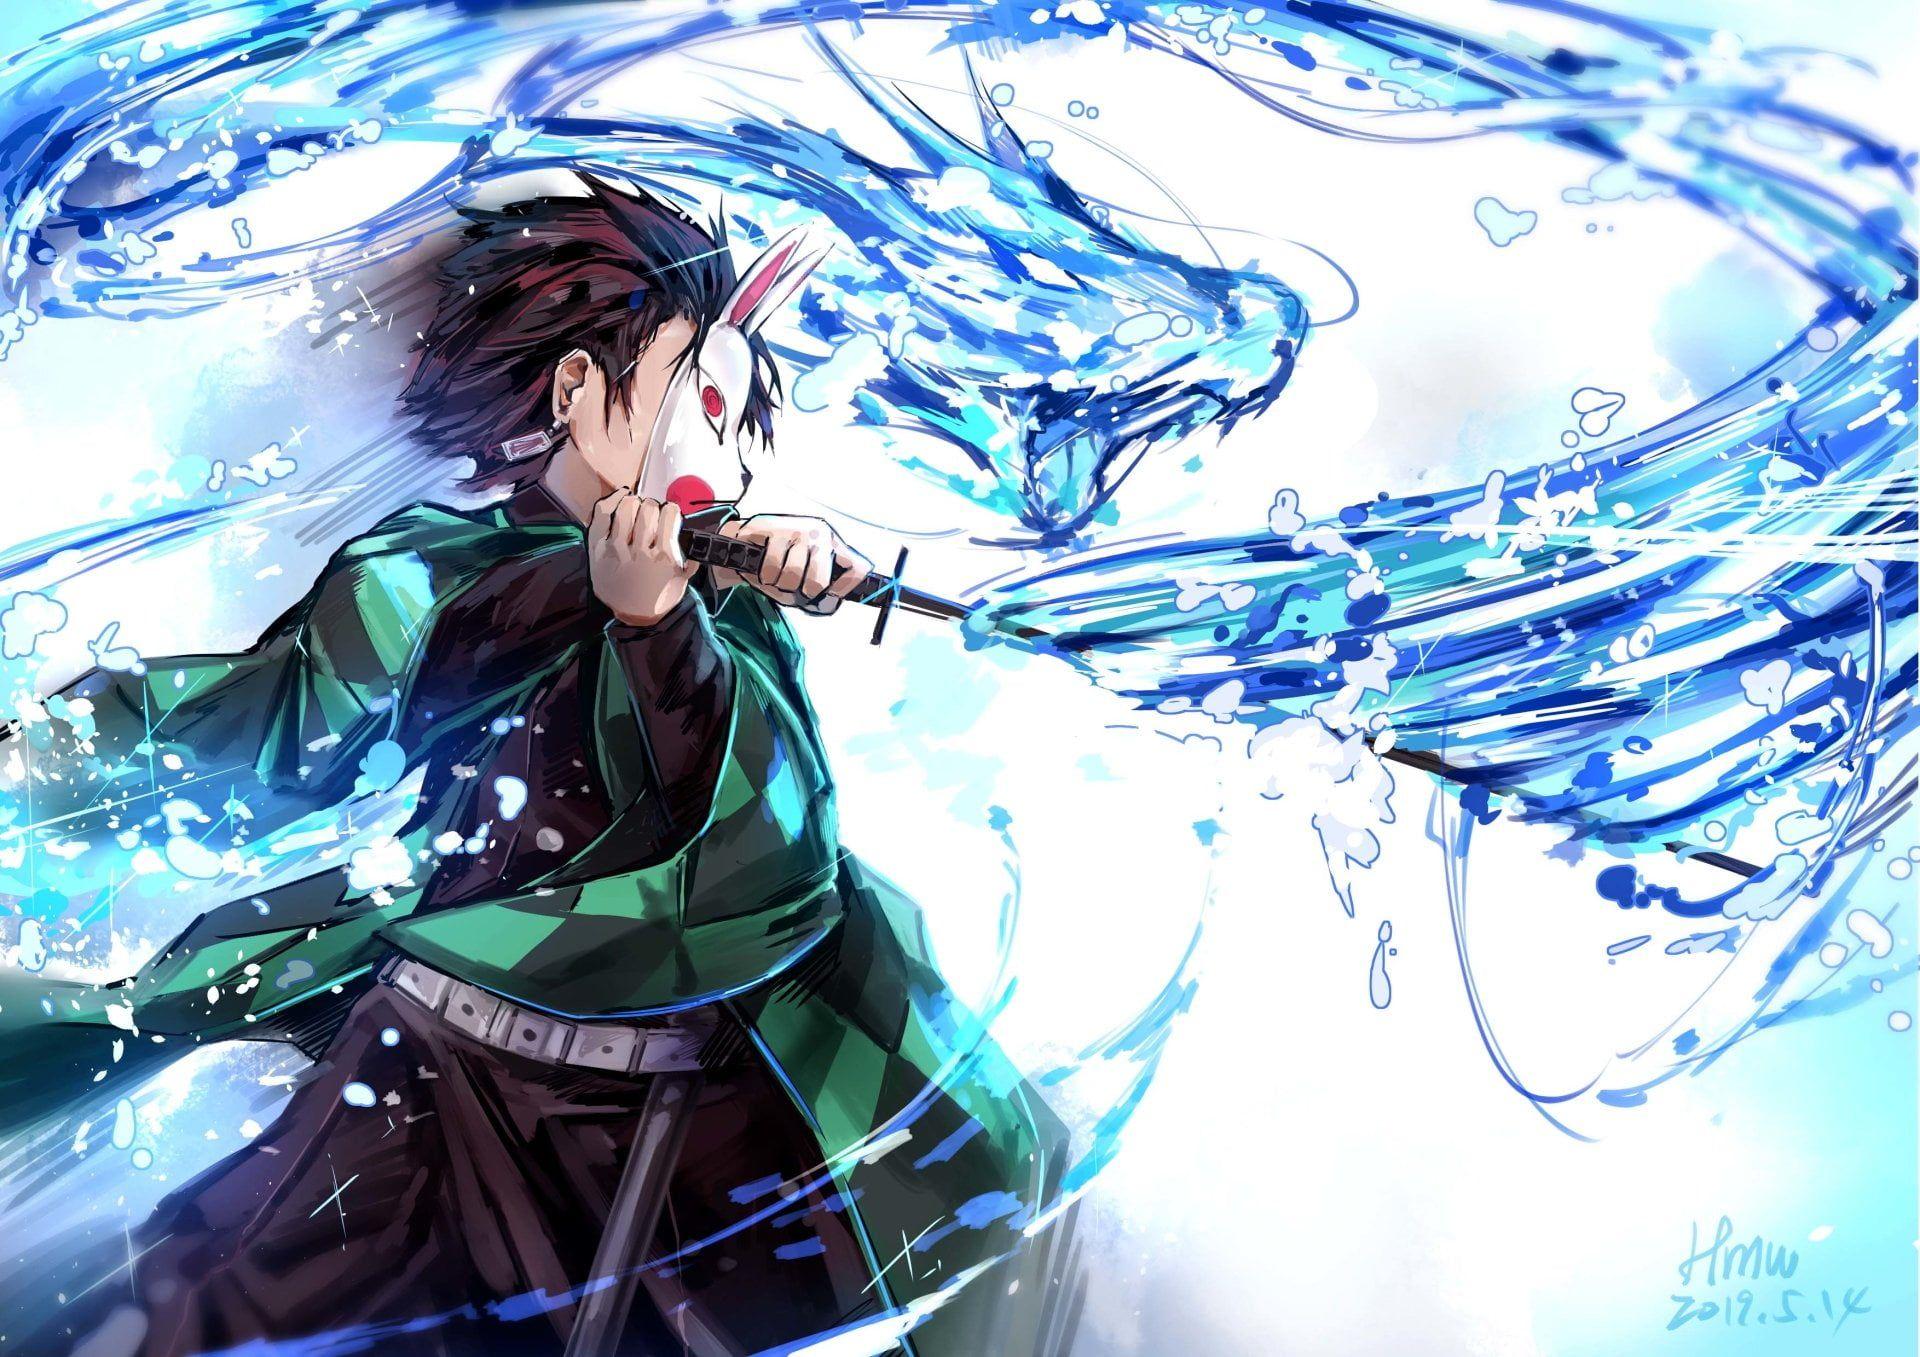 Kimetsu No Yaiba Tanjiro Kamado Anime 1080p Wallpaper Hdwallpaper Desktop Anime Demon Slayer Anime Anime Images